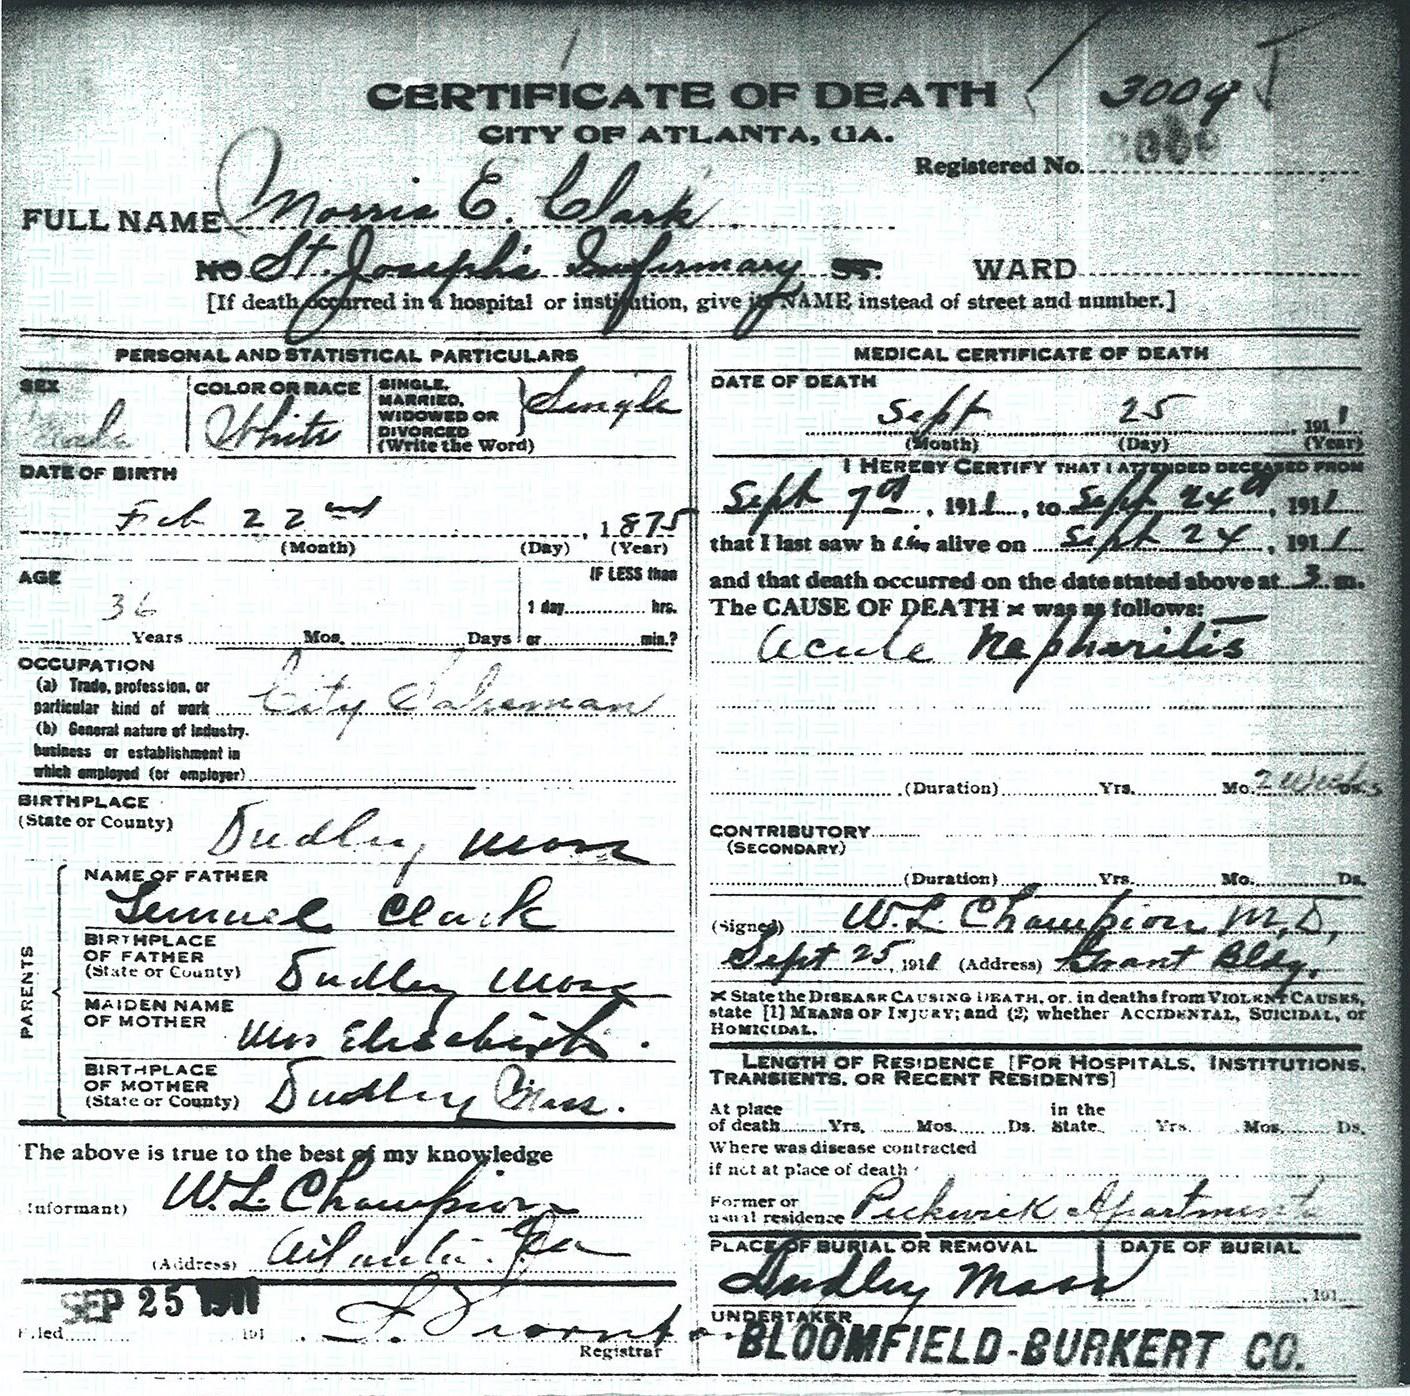 Finding uncle morris vita brevis death certificate for morris e clark city of atlanta death certificate 3009 aiddatafo Gallery